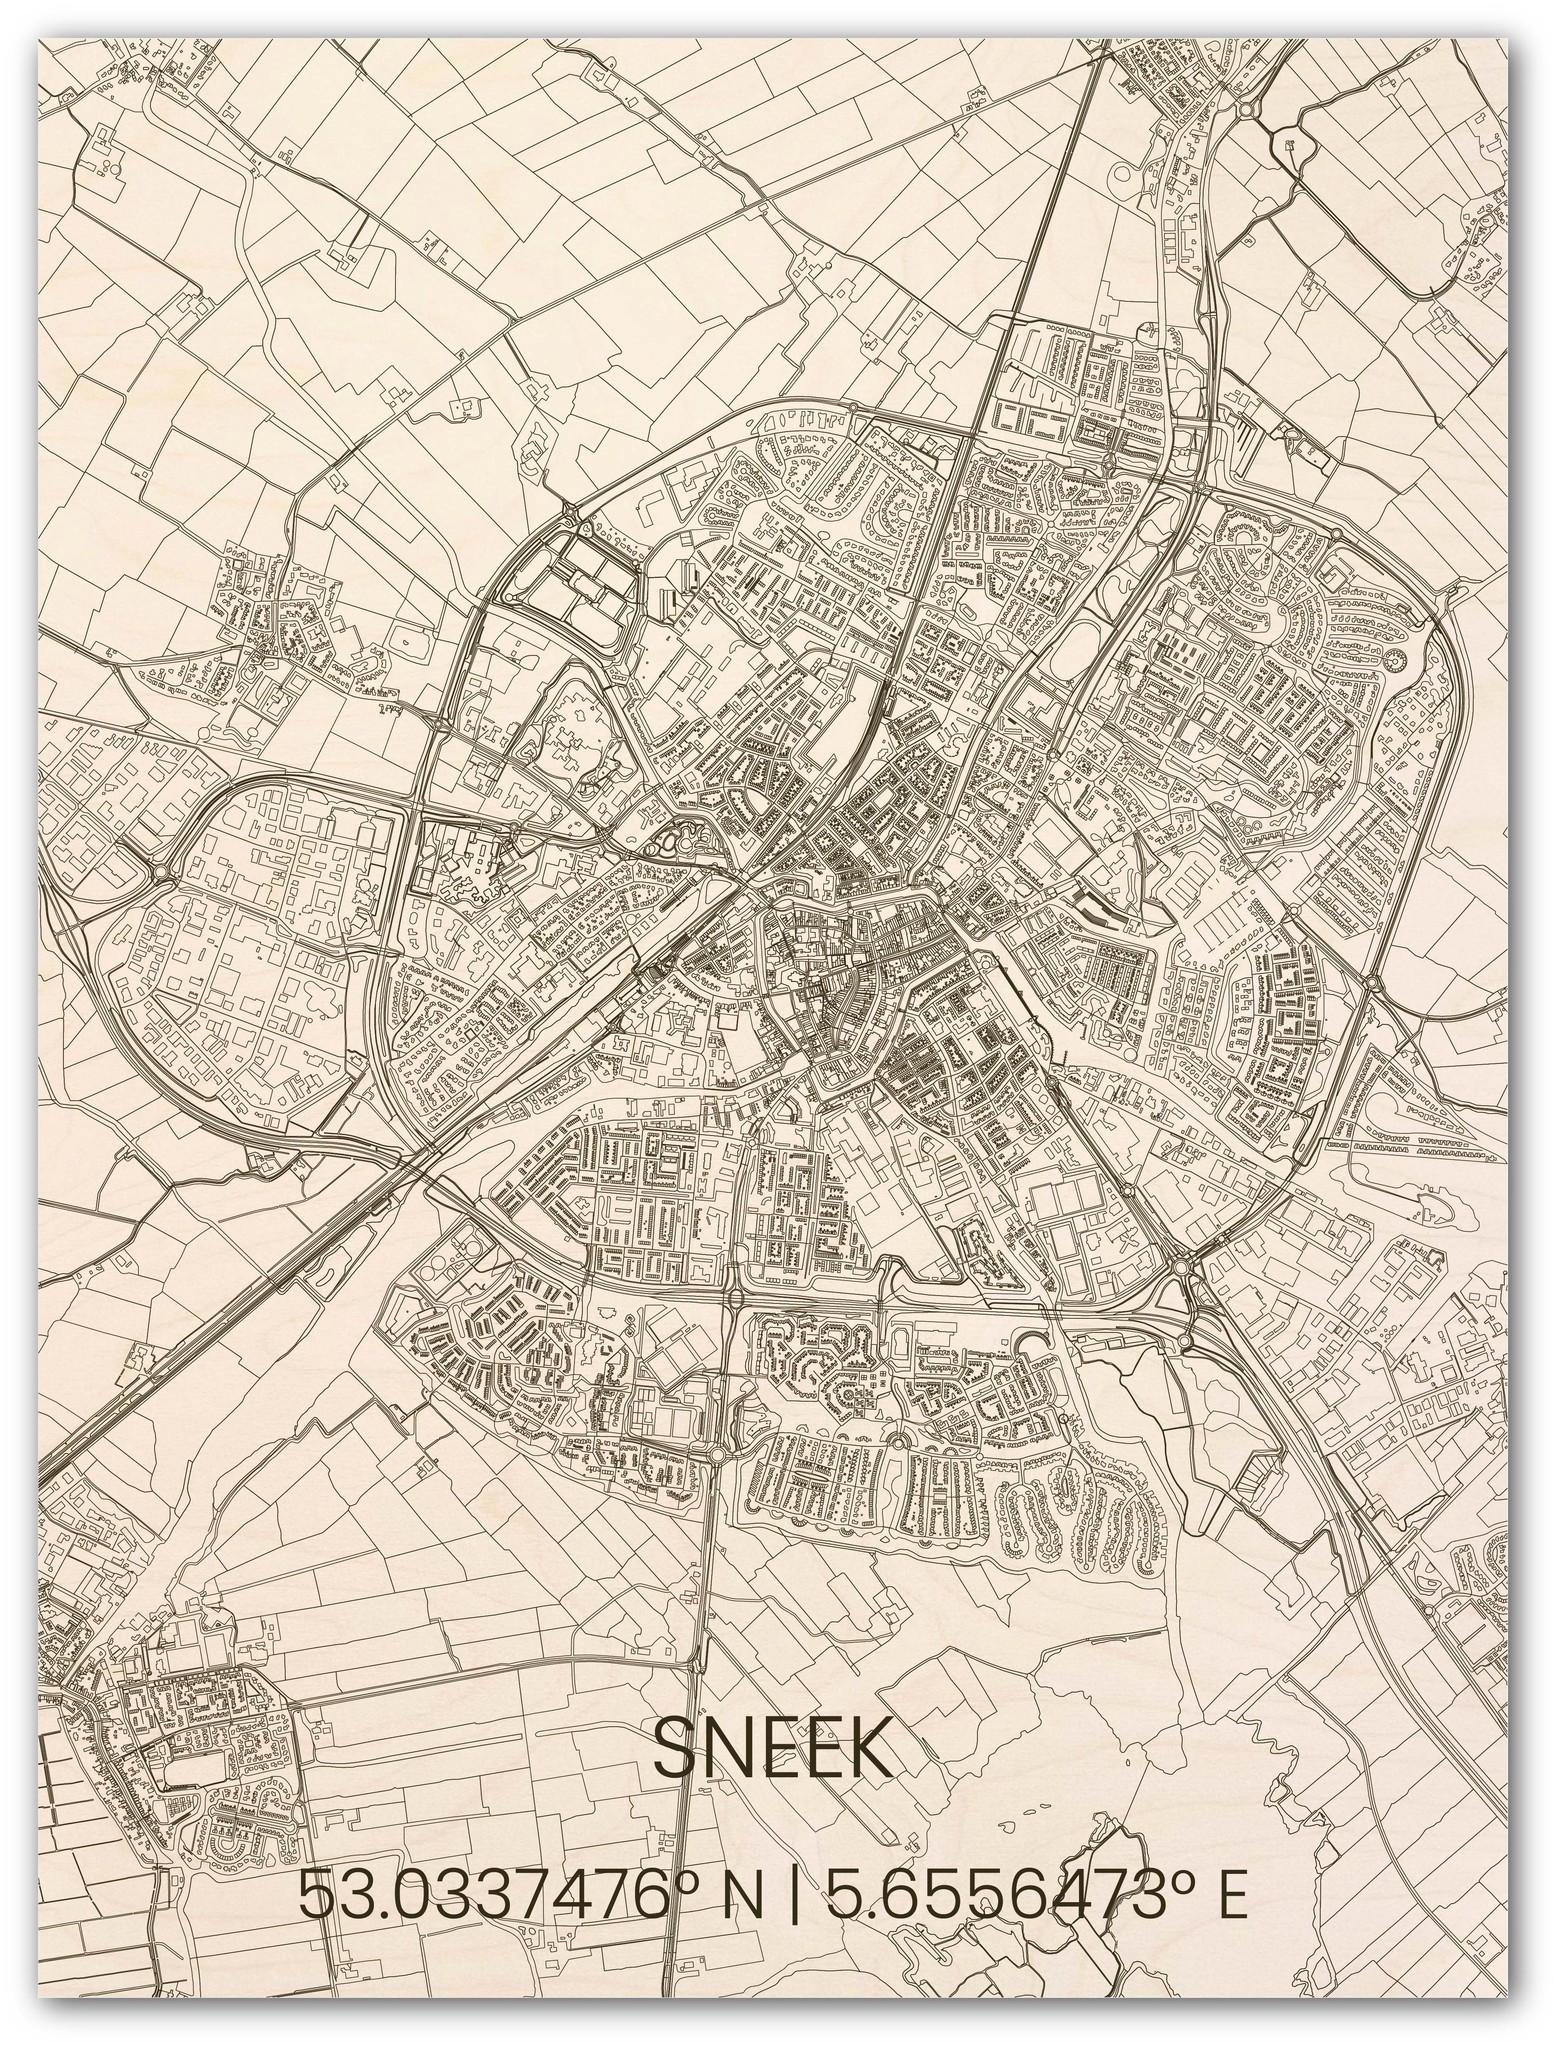 Houten stadsplattegrond Sneek-1